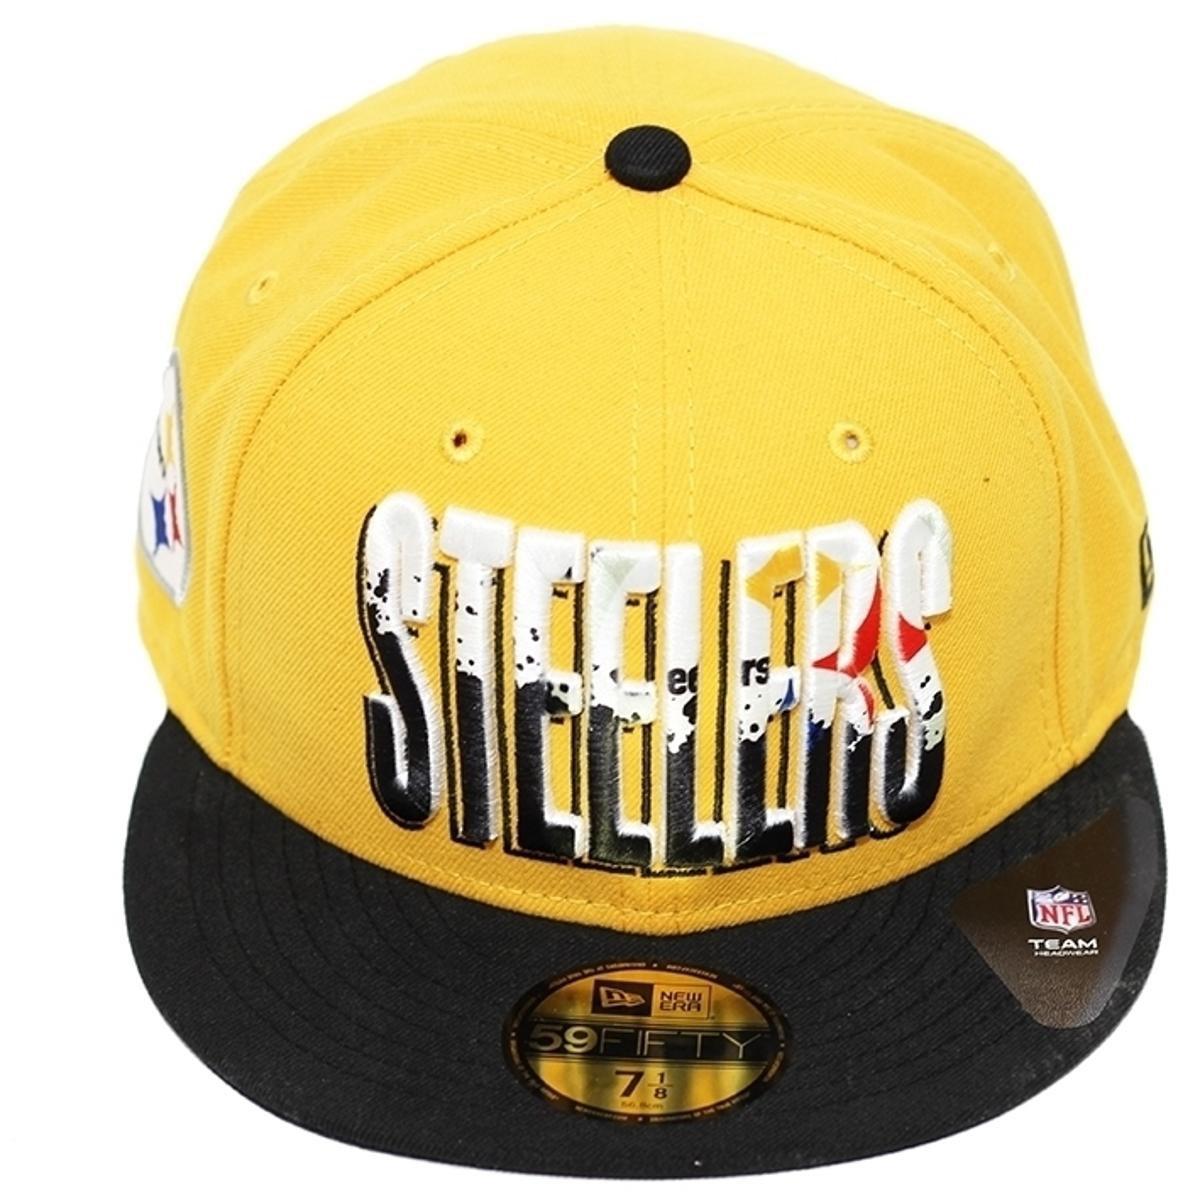 Boné New Era Aba Reta Fechado Nfl Steelers Splatter Fill - Amarelo ... 29605bf32d5e0